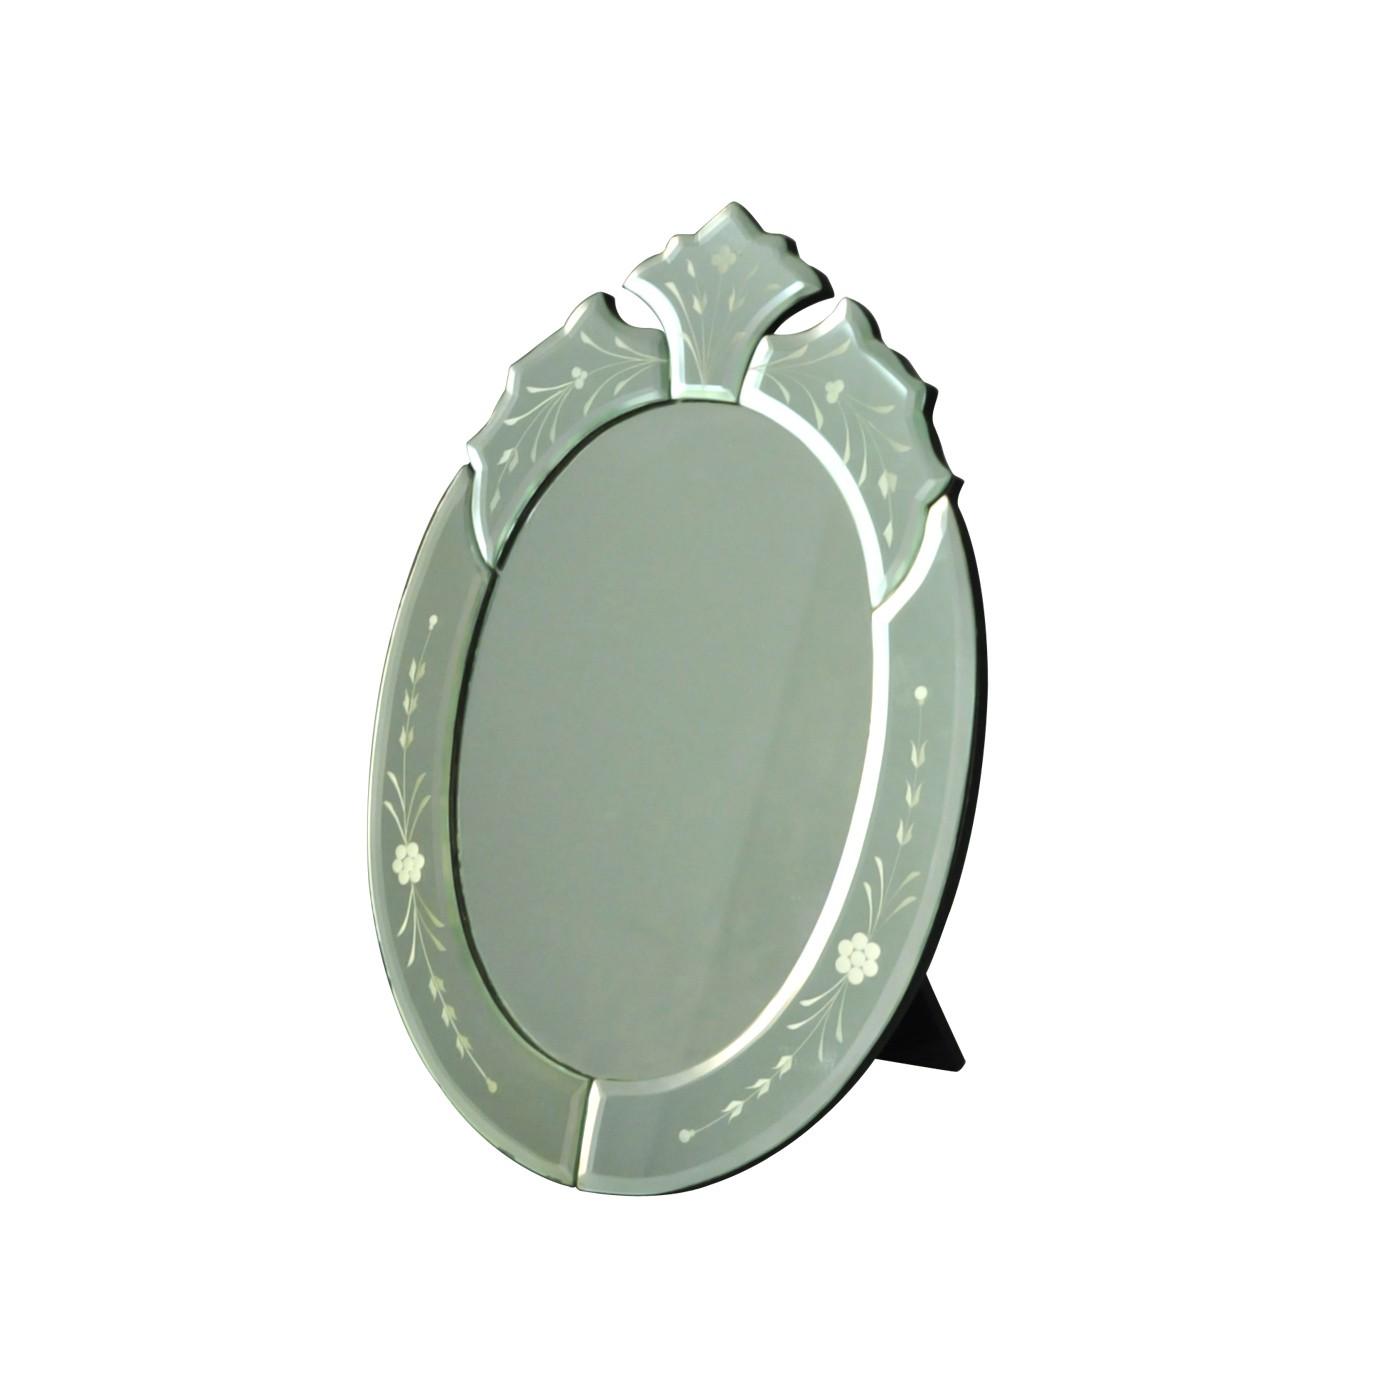 miroir ovale glace de venise demeure et jardin. Black Bedroom Furniture Sets. Home Design Ideas